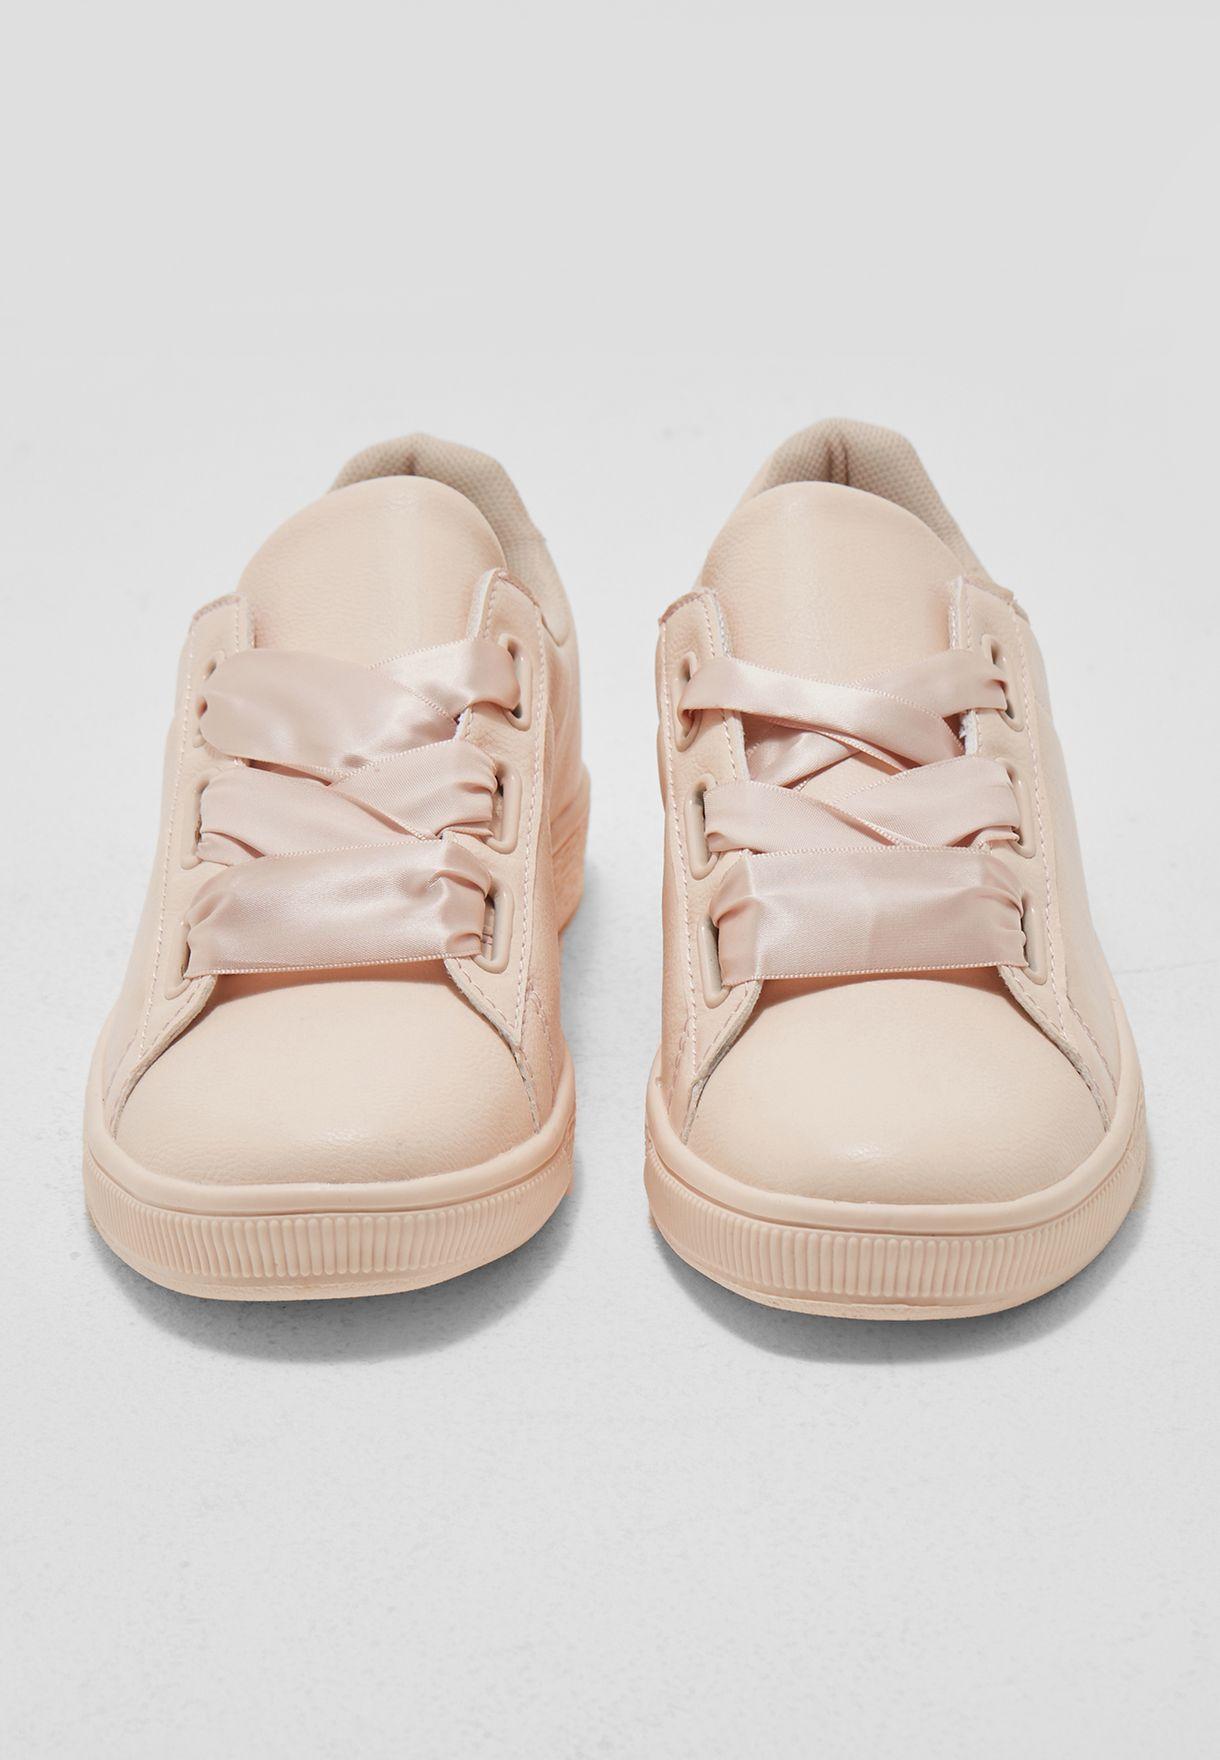 Augustana Sneakers